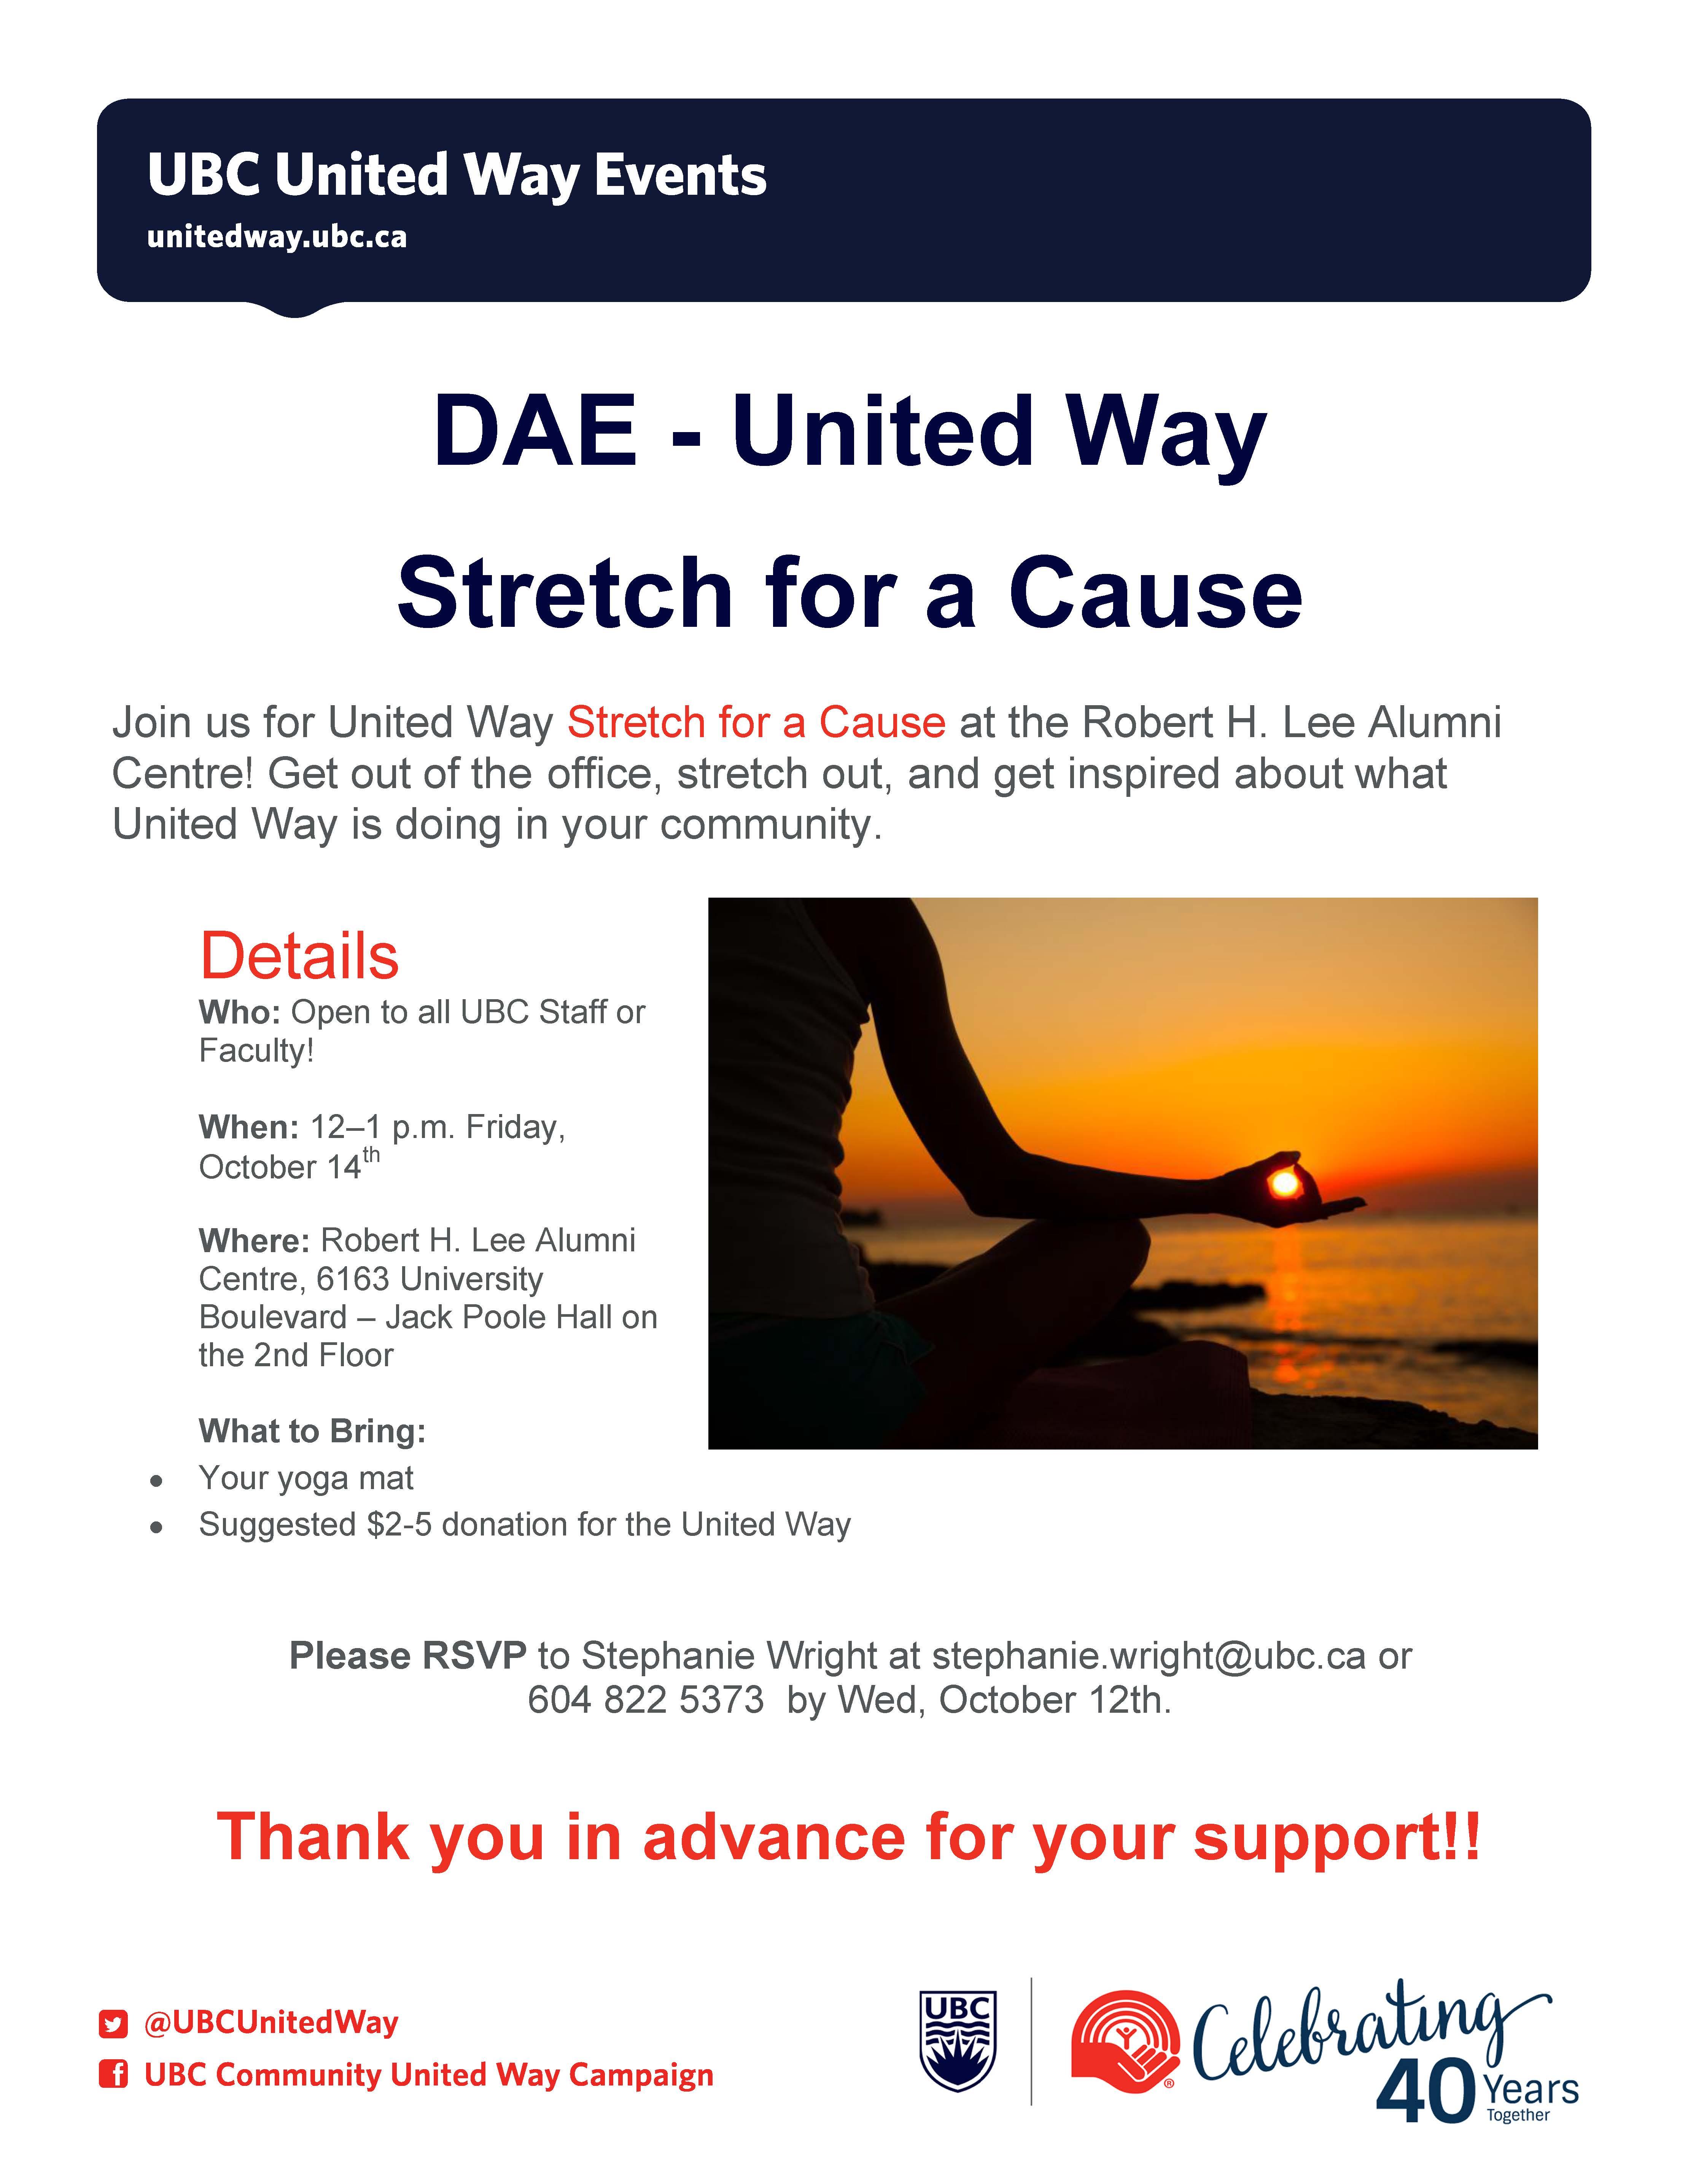 dae_yoga